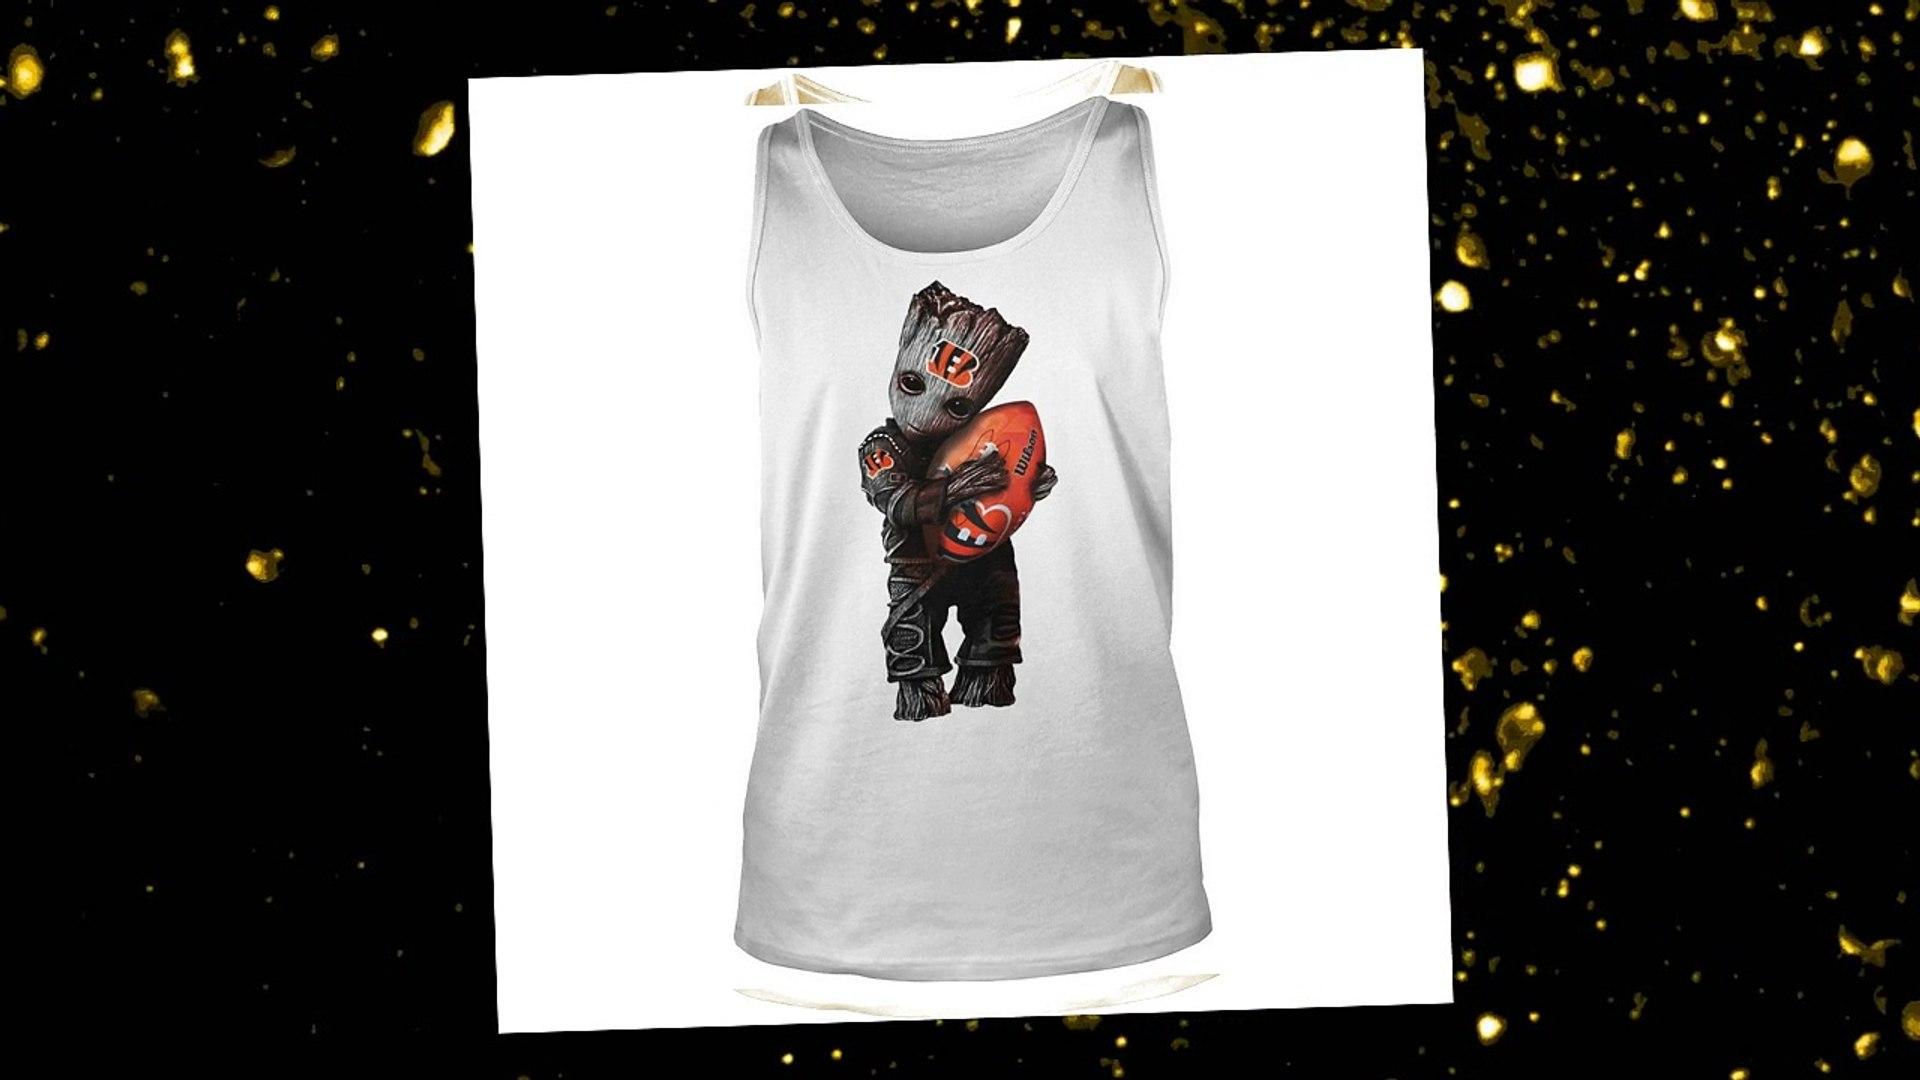 Baby Groot hug Cincinnati Bengals shirt and youth tee